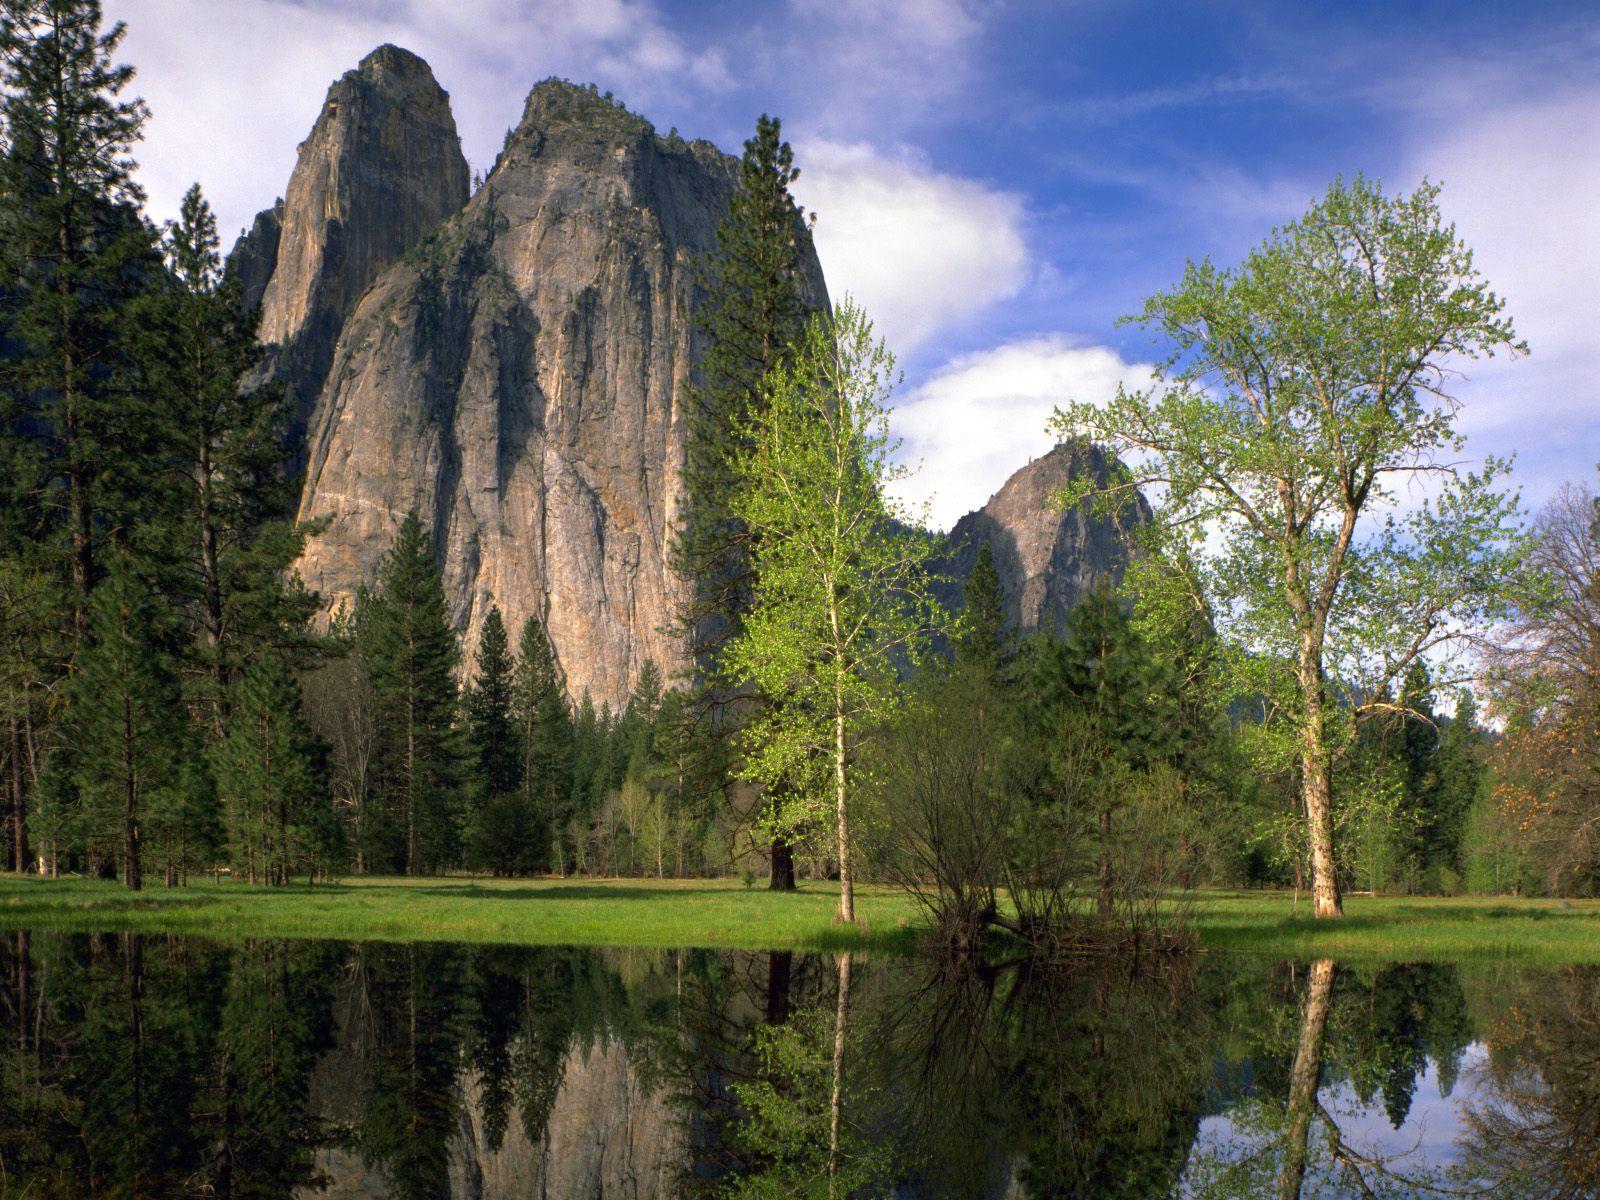 Wallpapers Unlimited Yosemite National Park California USA 1600x1200